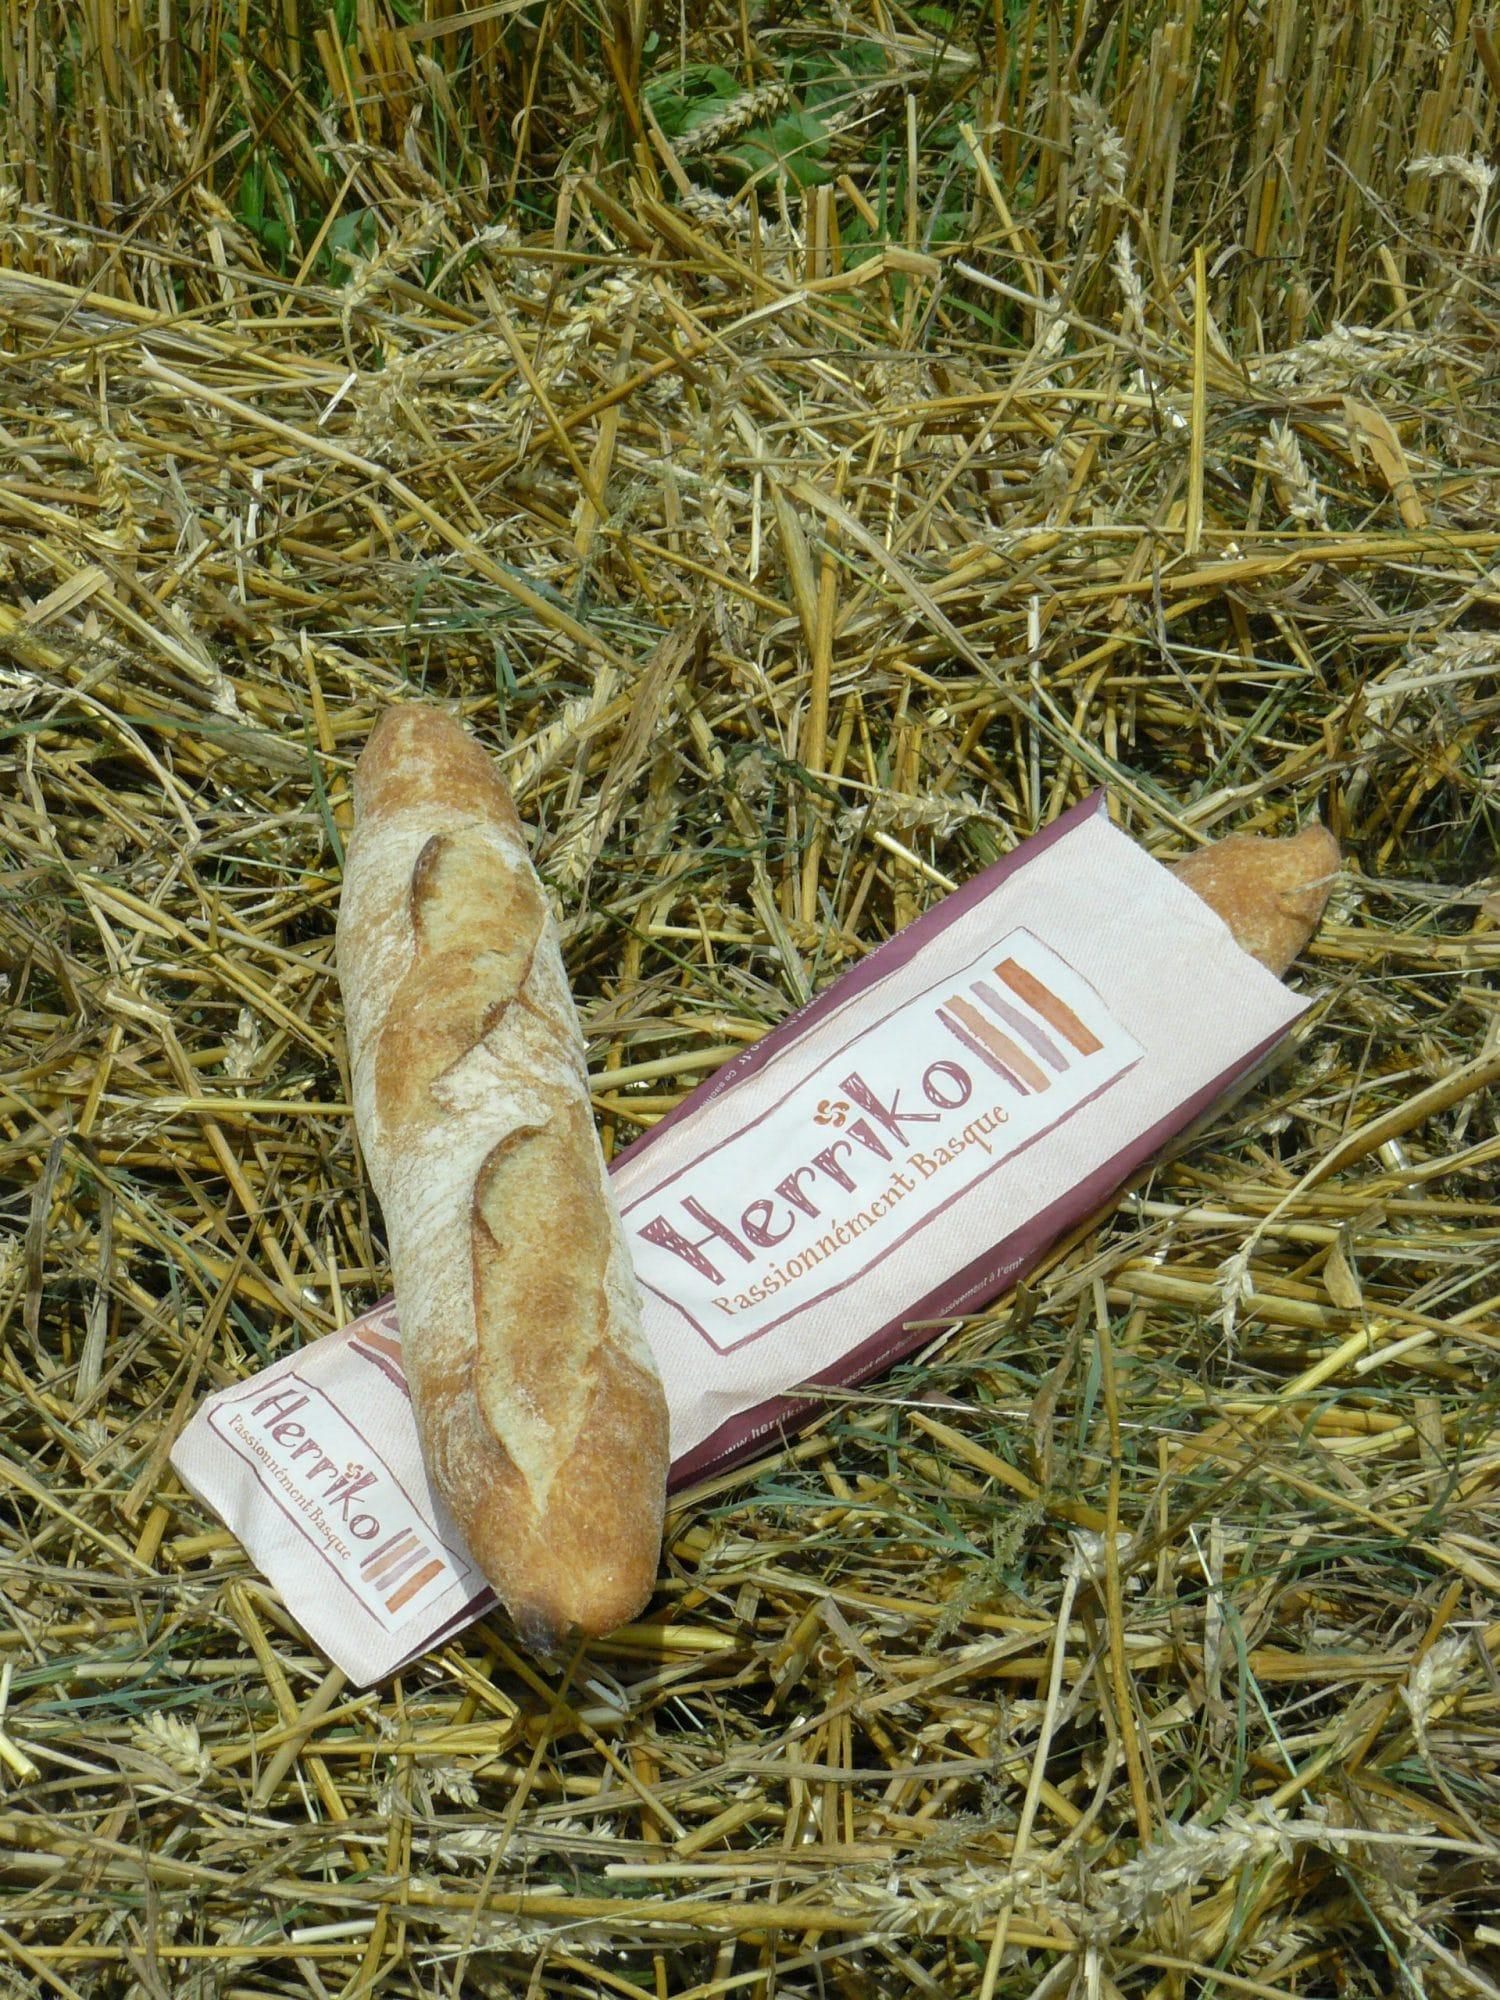 herriko-ble-pays-basque-baguette